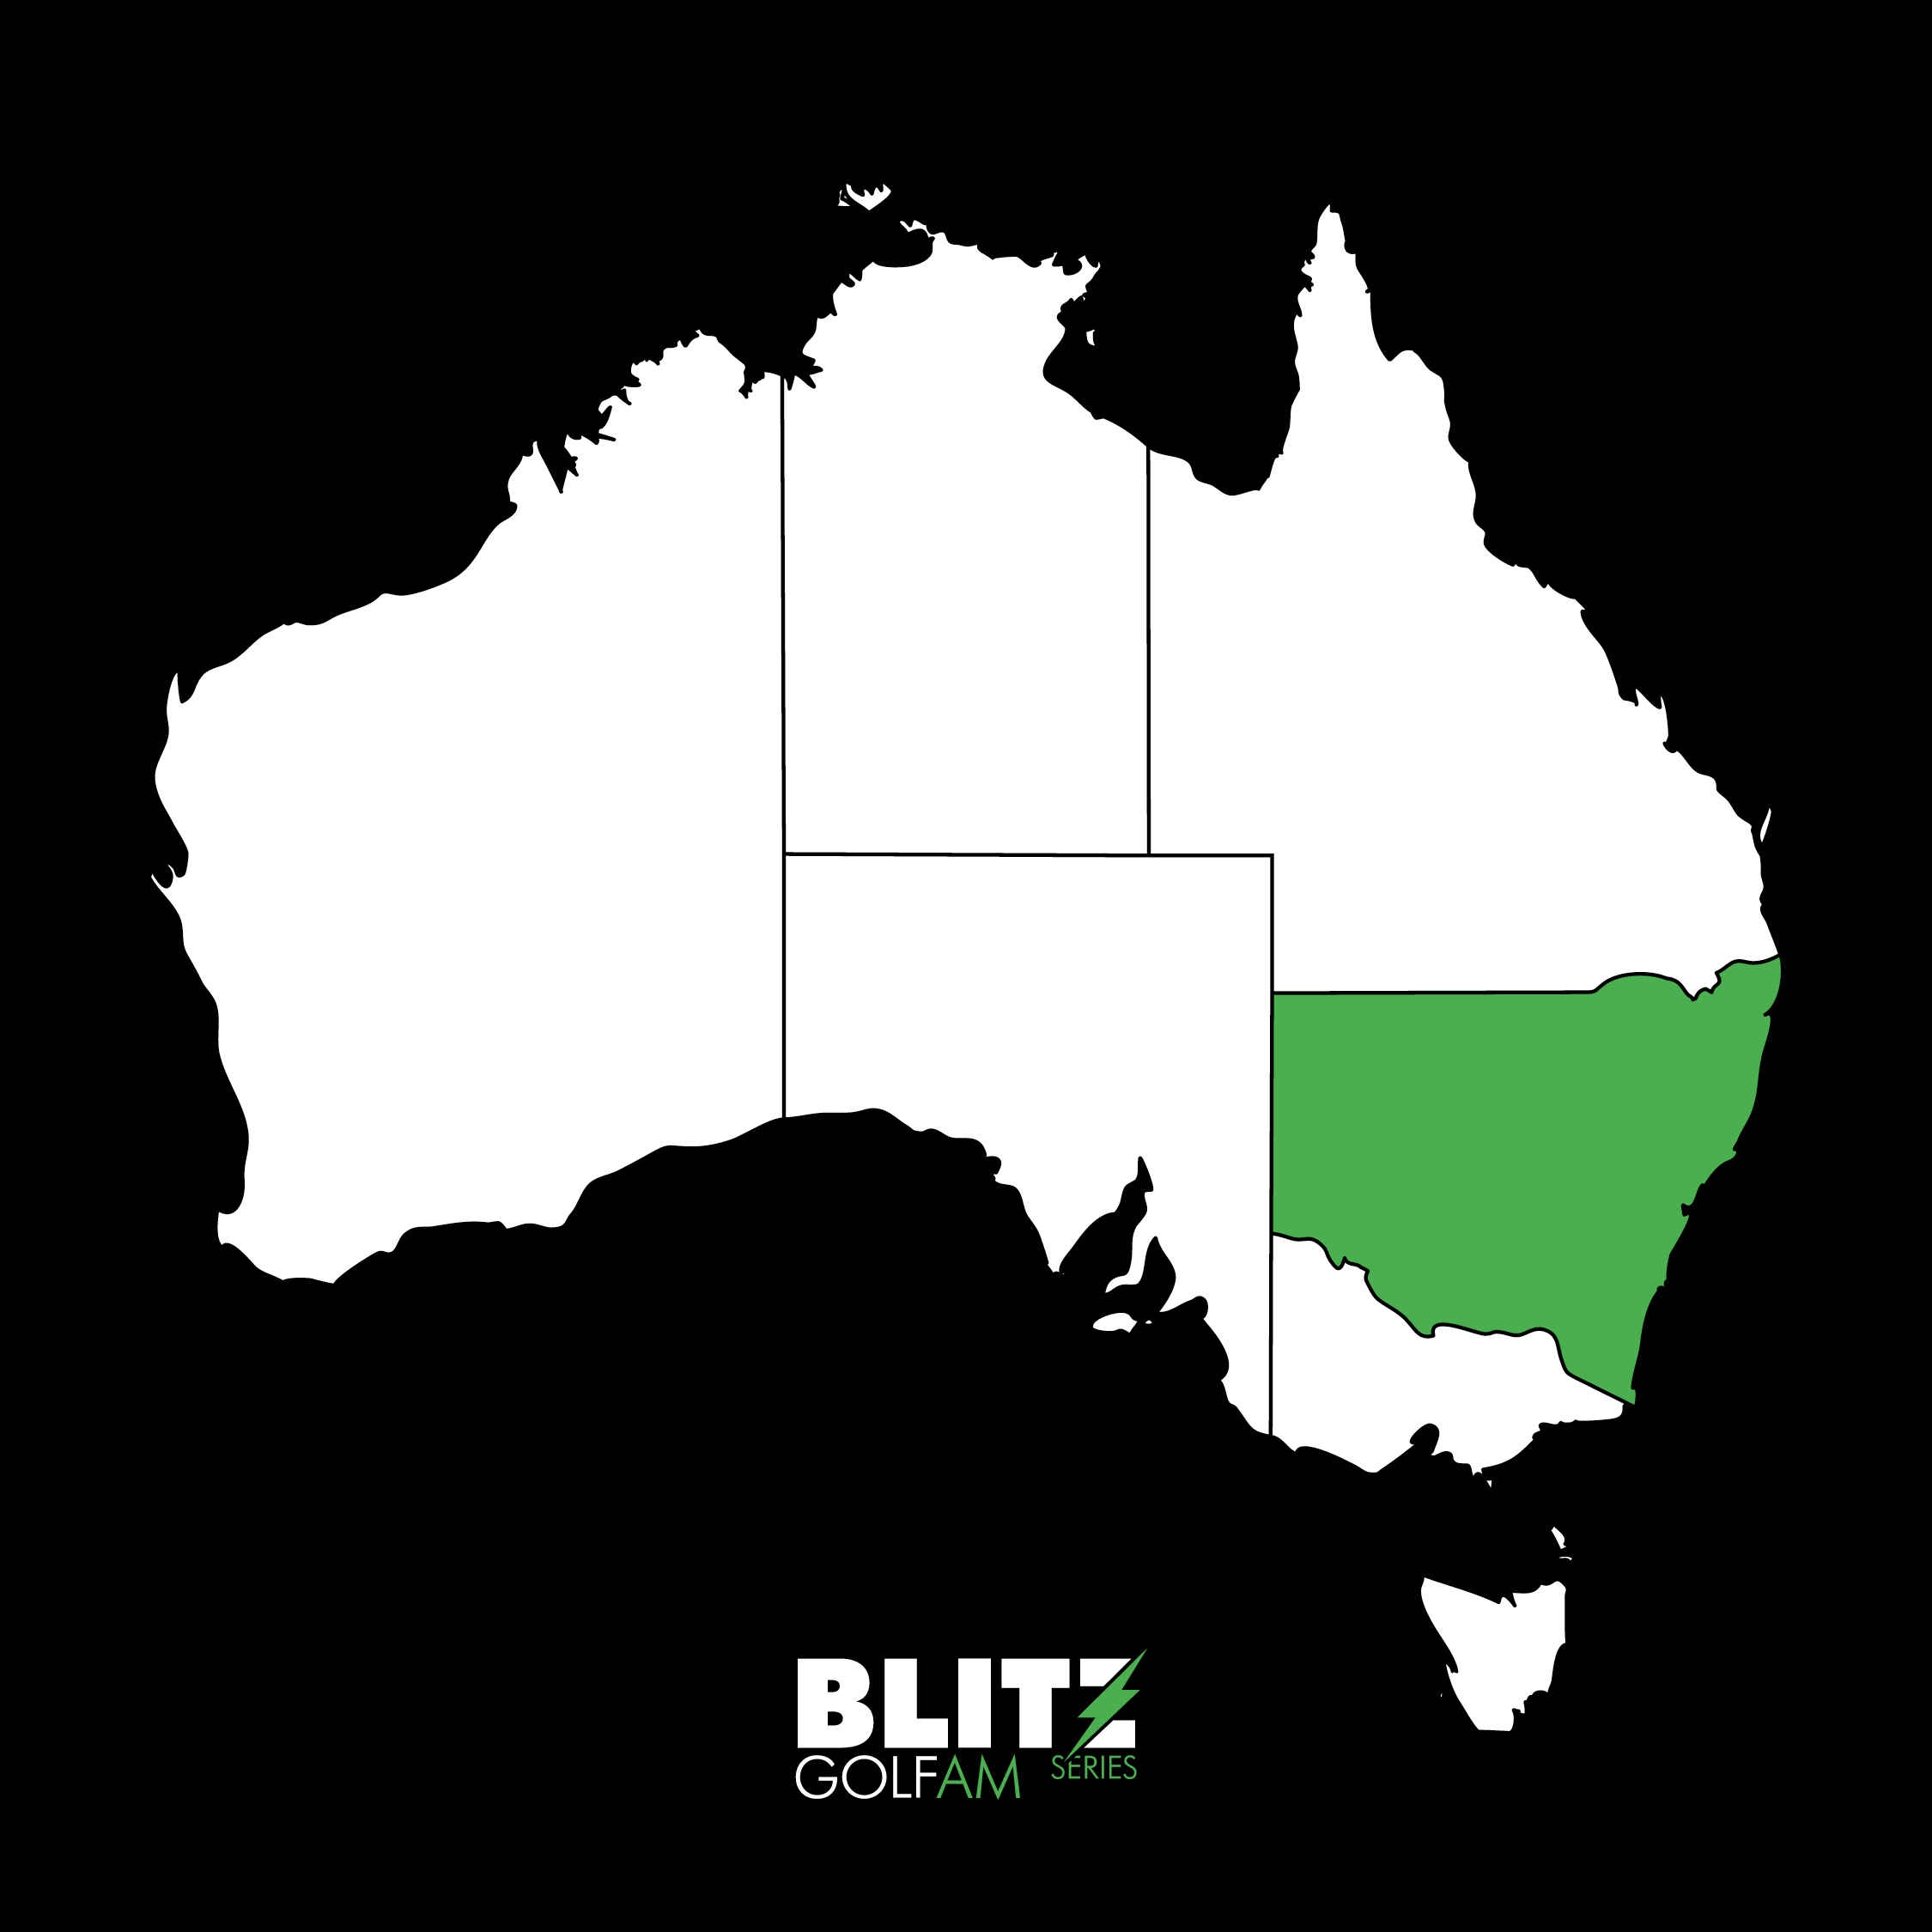 New South Wales / Australian Capital Territory Region